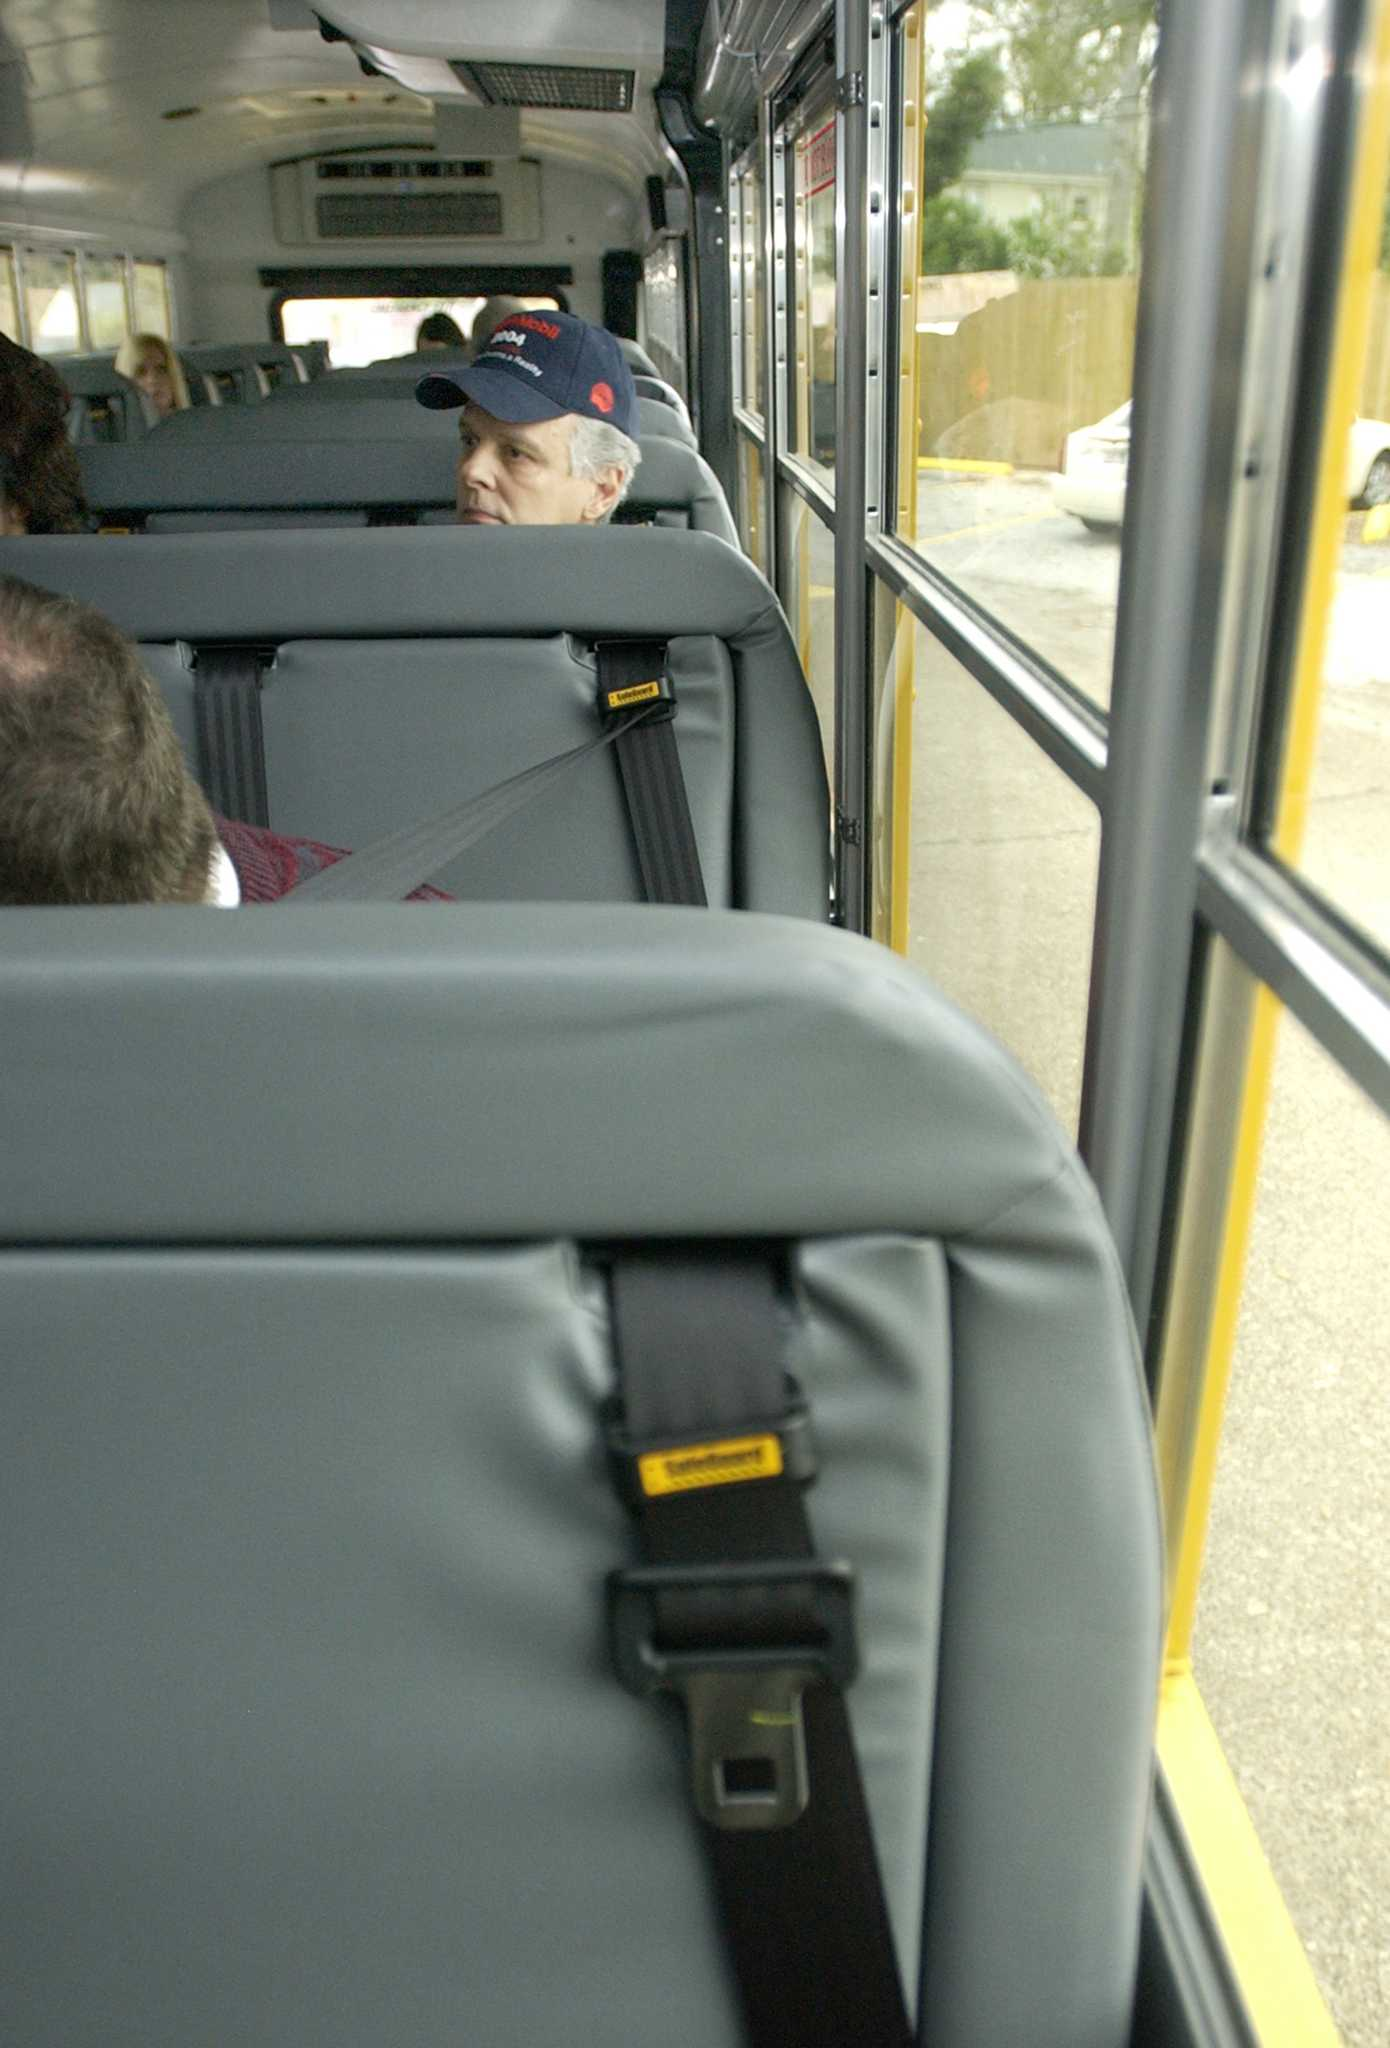 Pet Seat Belt >> Texas senators respond to concerns on bus seat belt law - Houston Chronicle